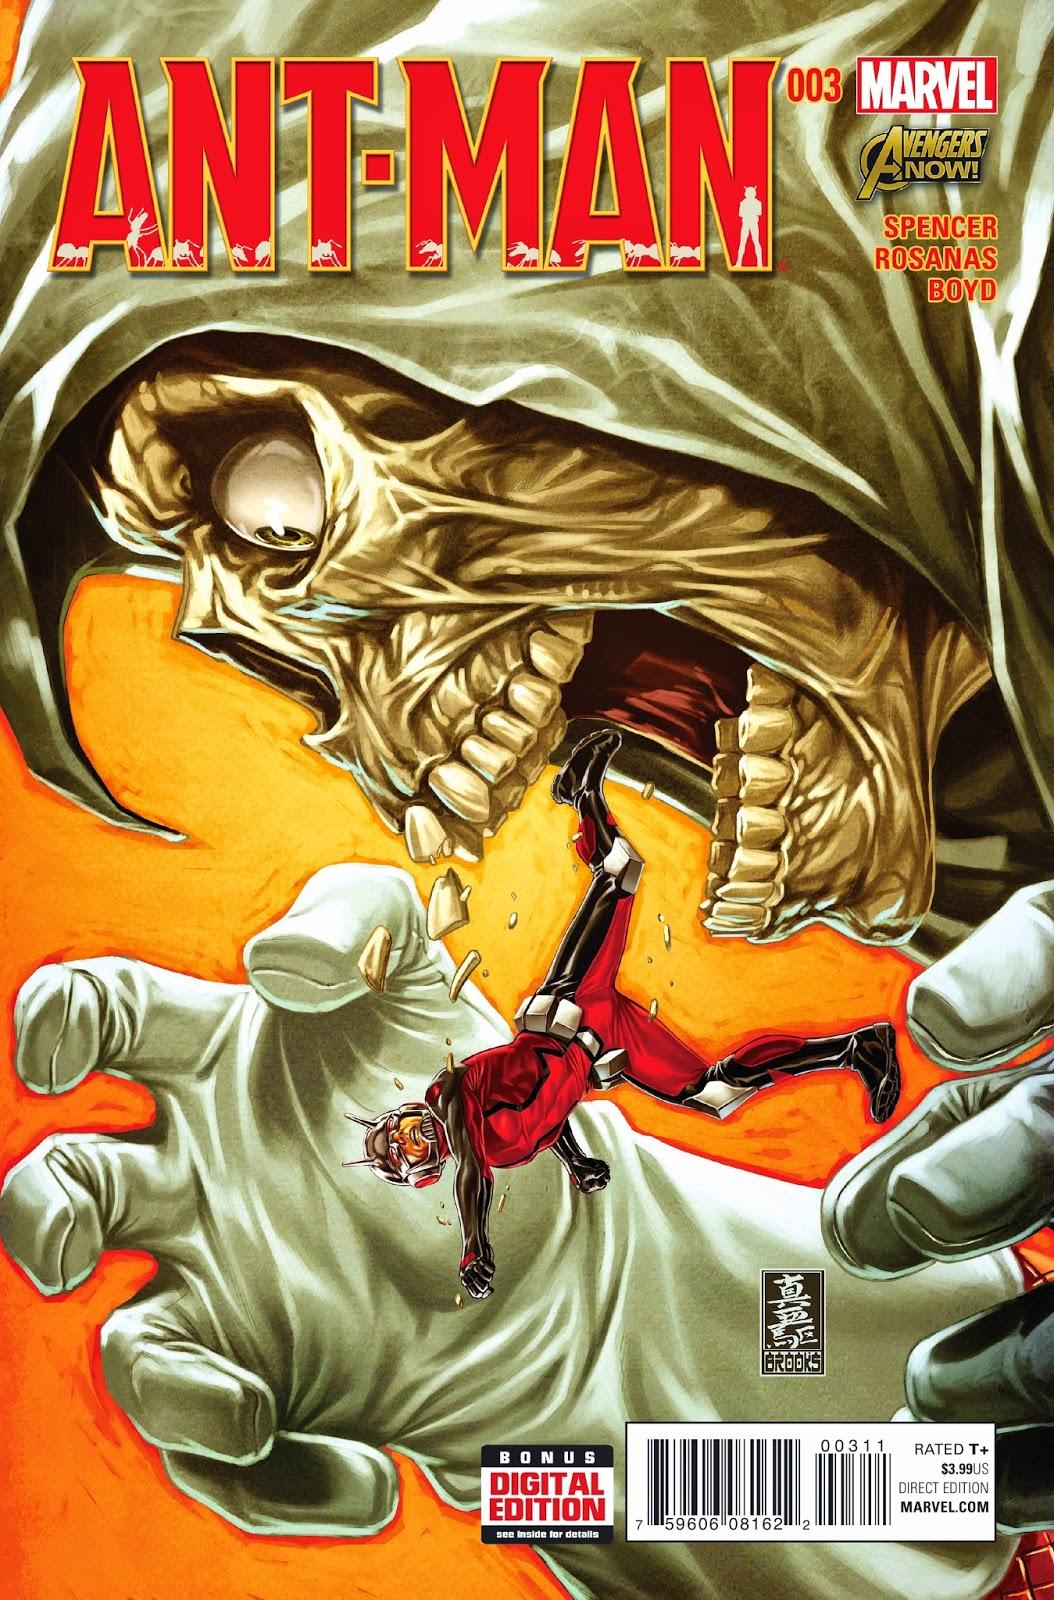 Ant-man versus Taskmaster